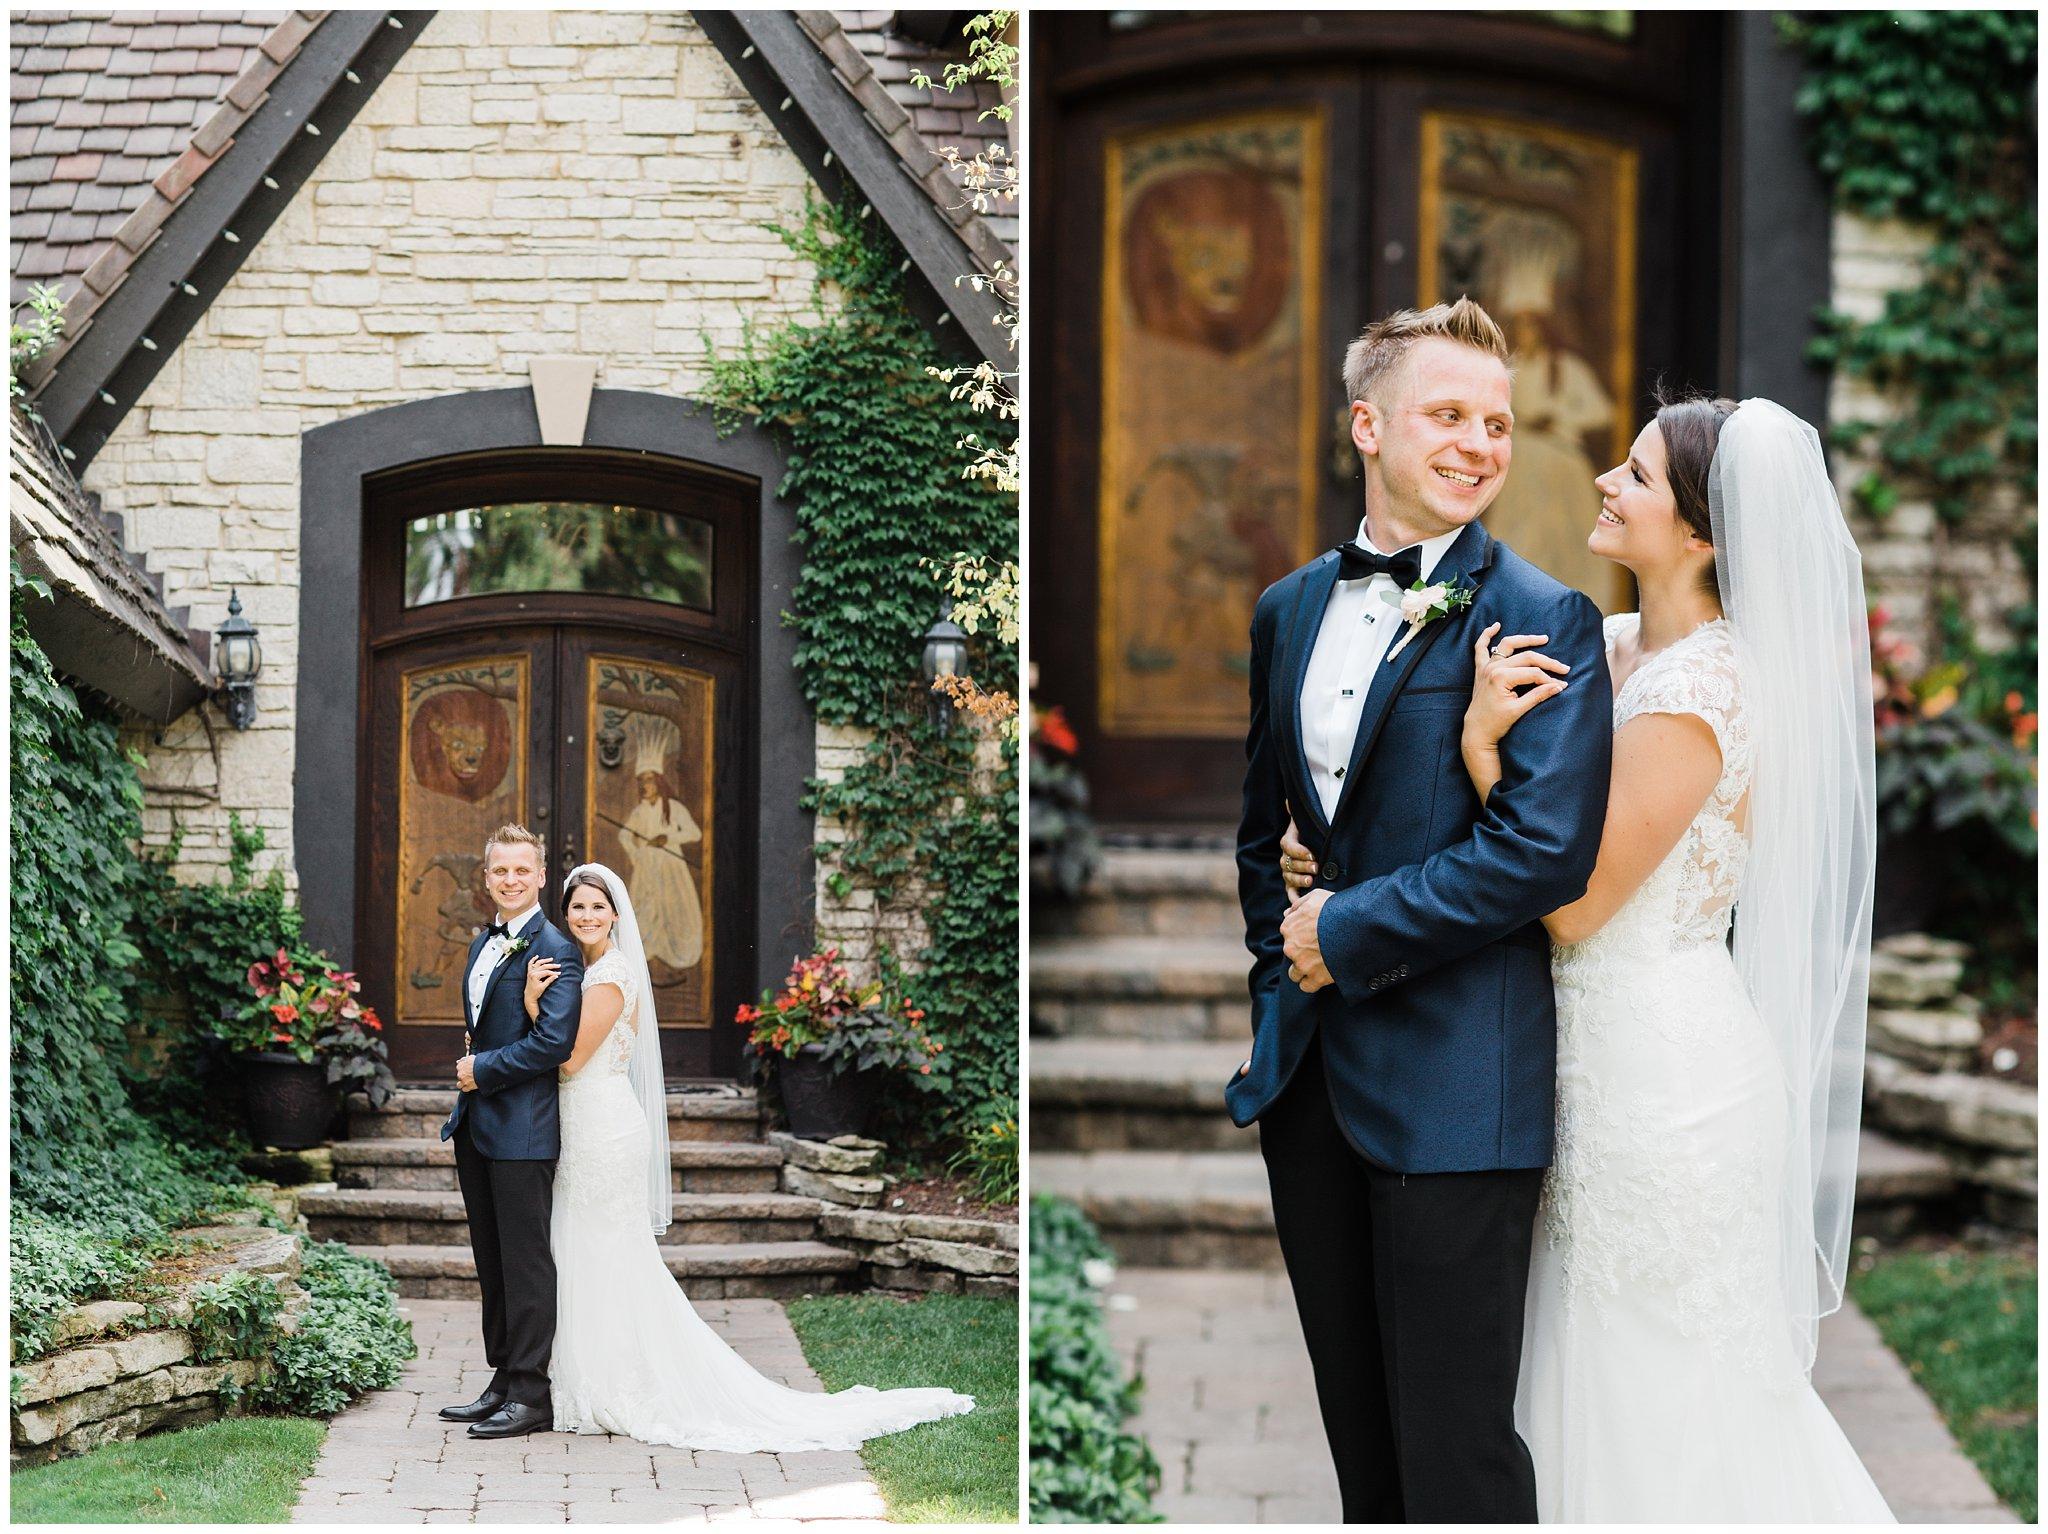 Alicia&Kurt_RavisloeCountryClubWedding_Chicagoweddingphotographer_RebeccaHaleyPhotography_0159.jpg